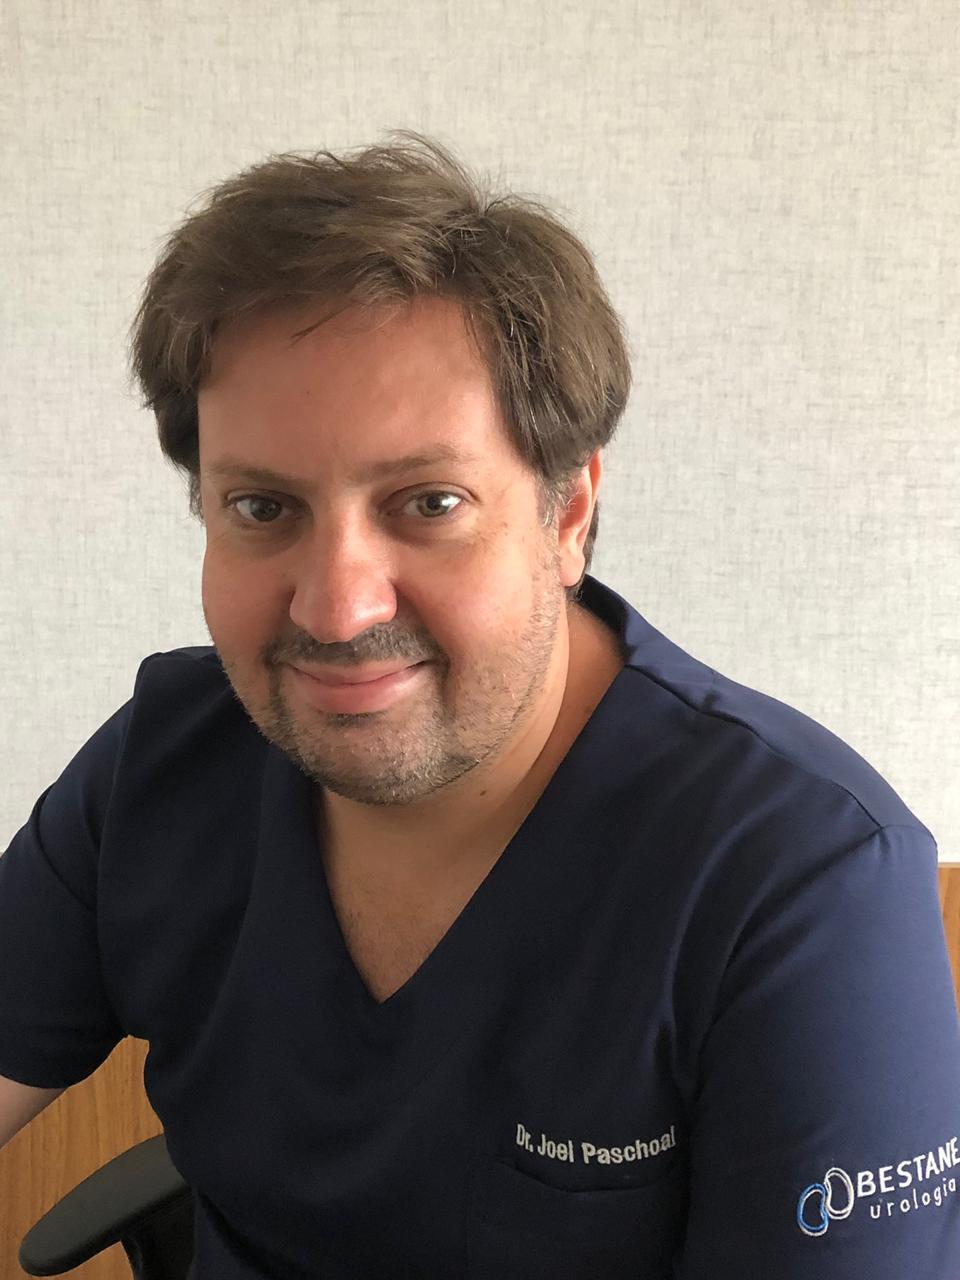 Dr Joel Paschoal